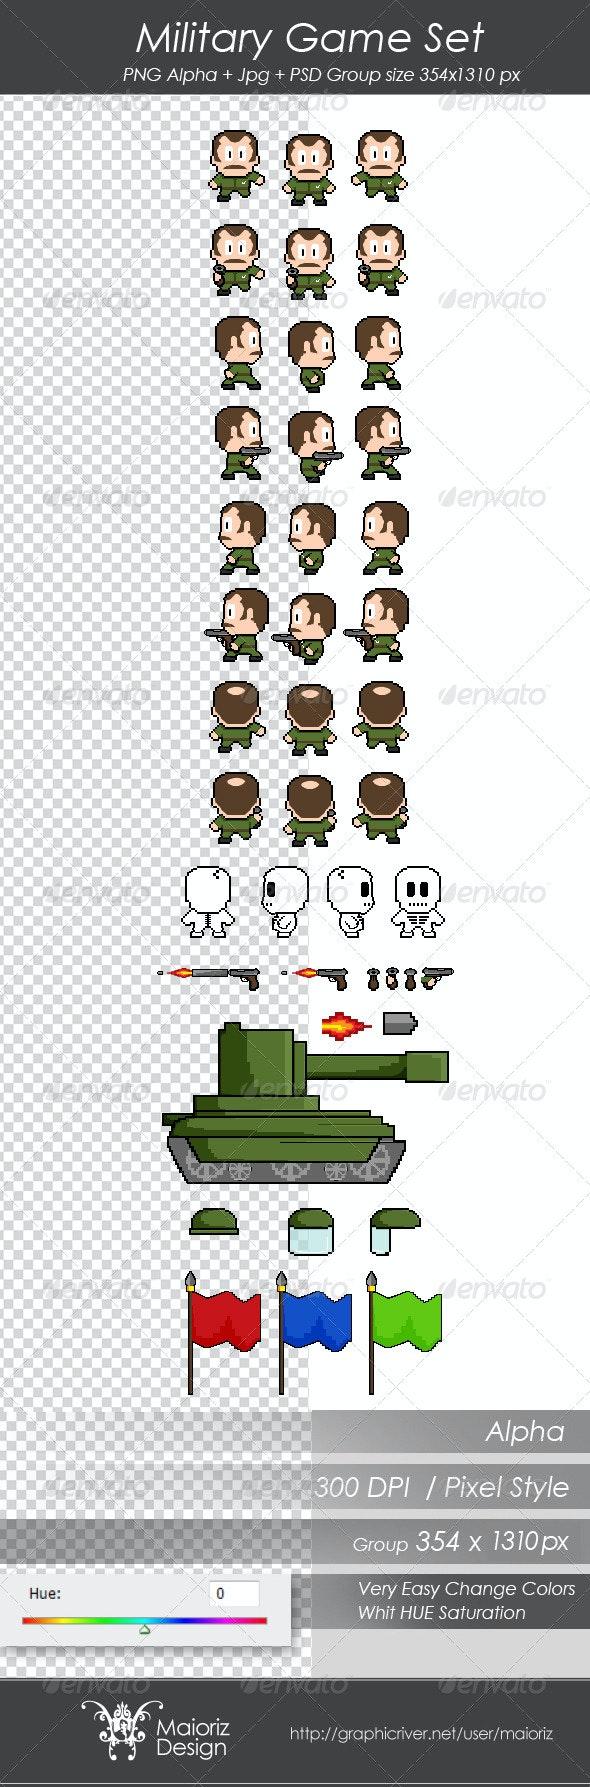 Military Game Set